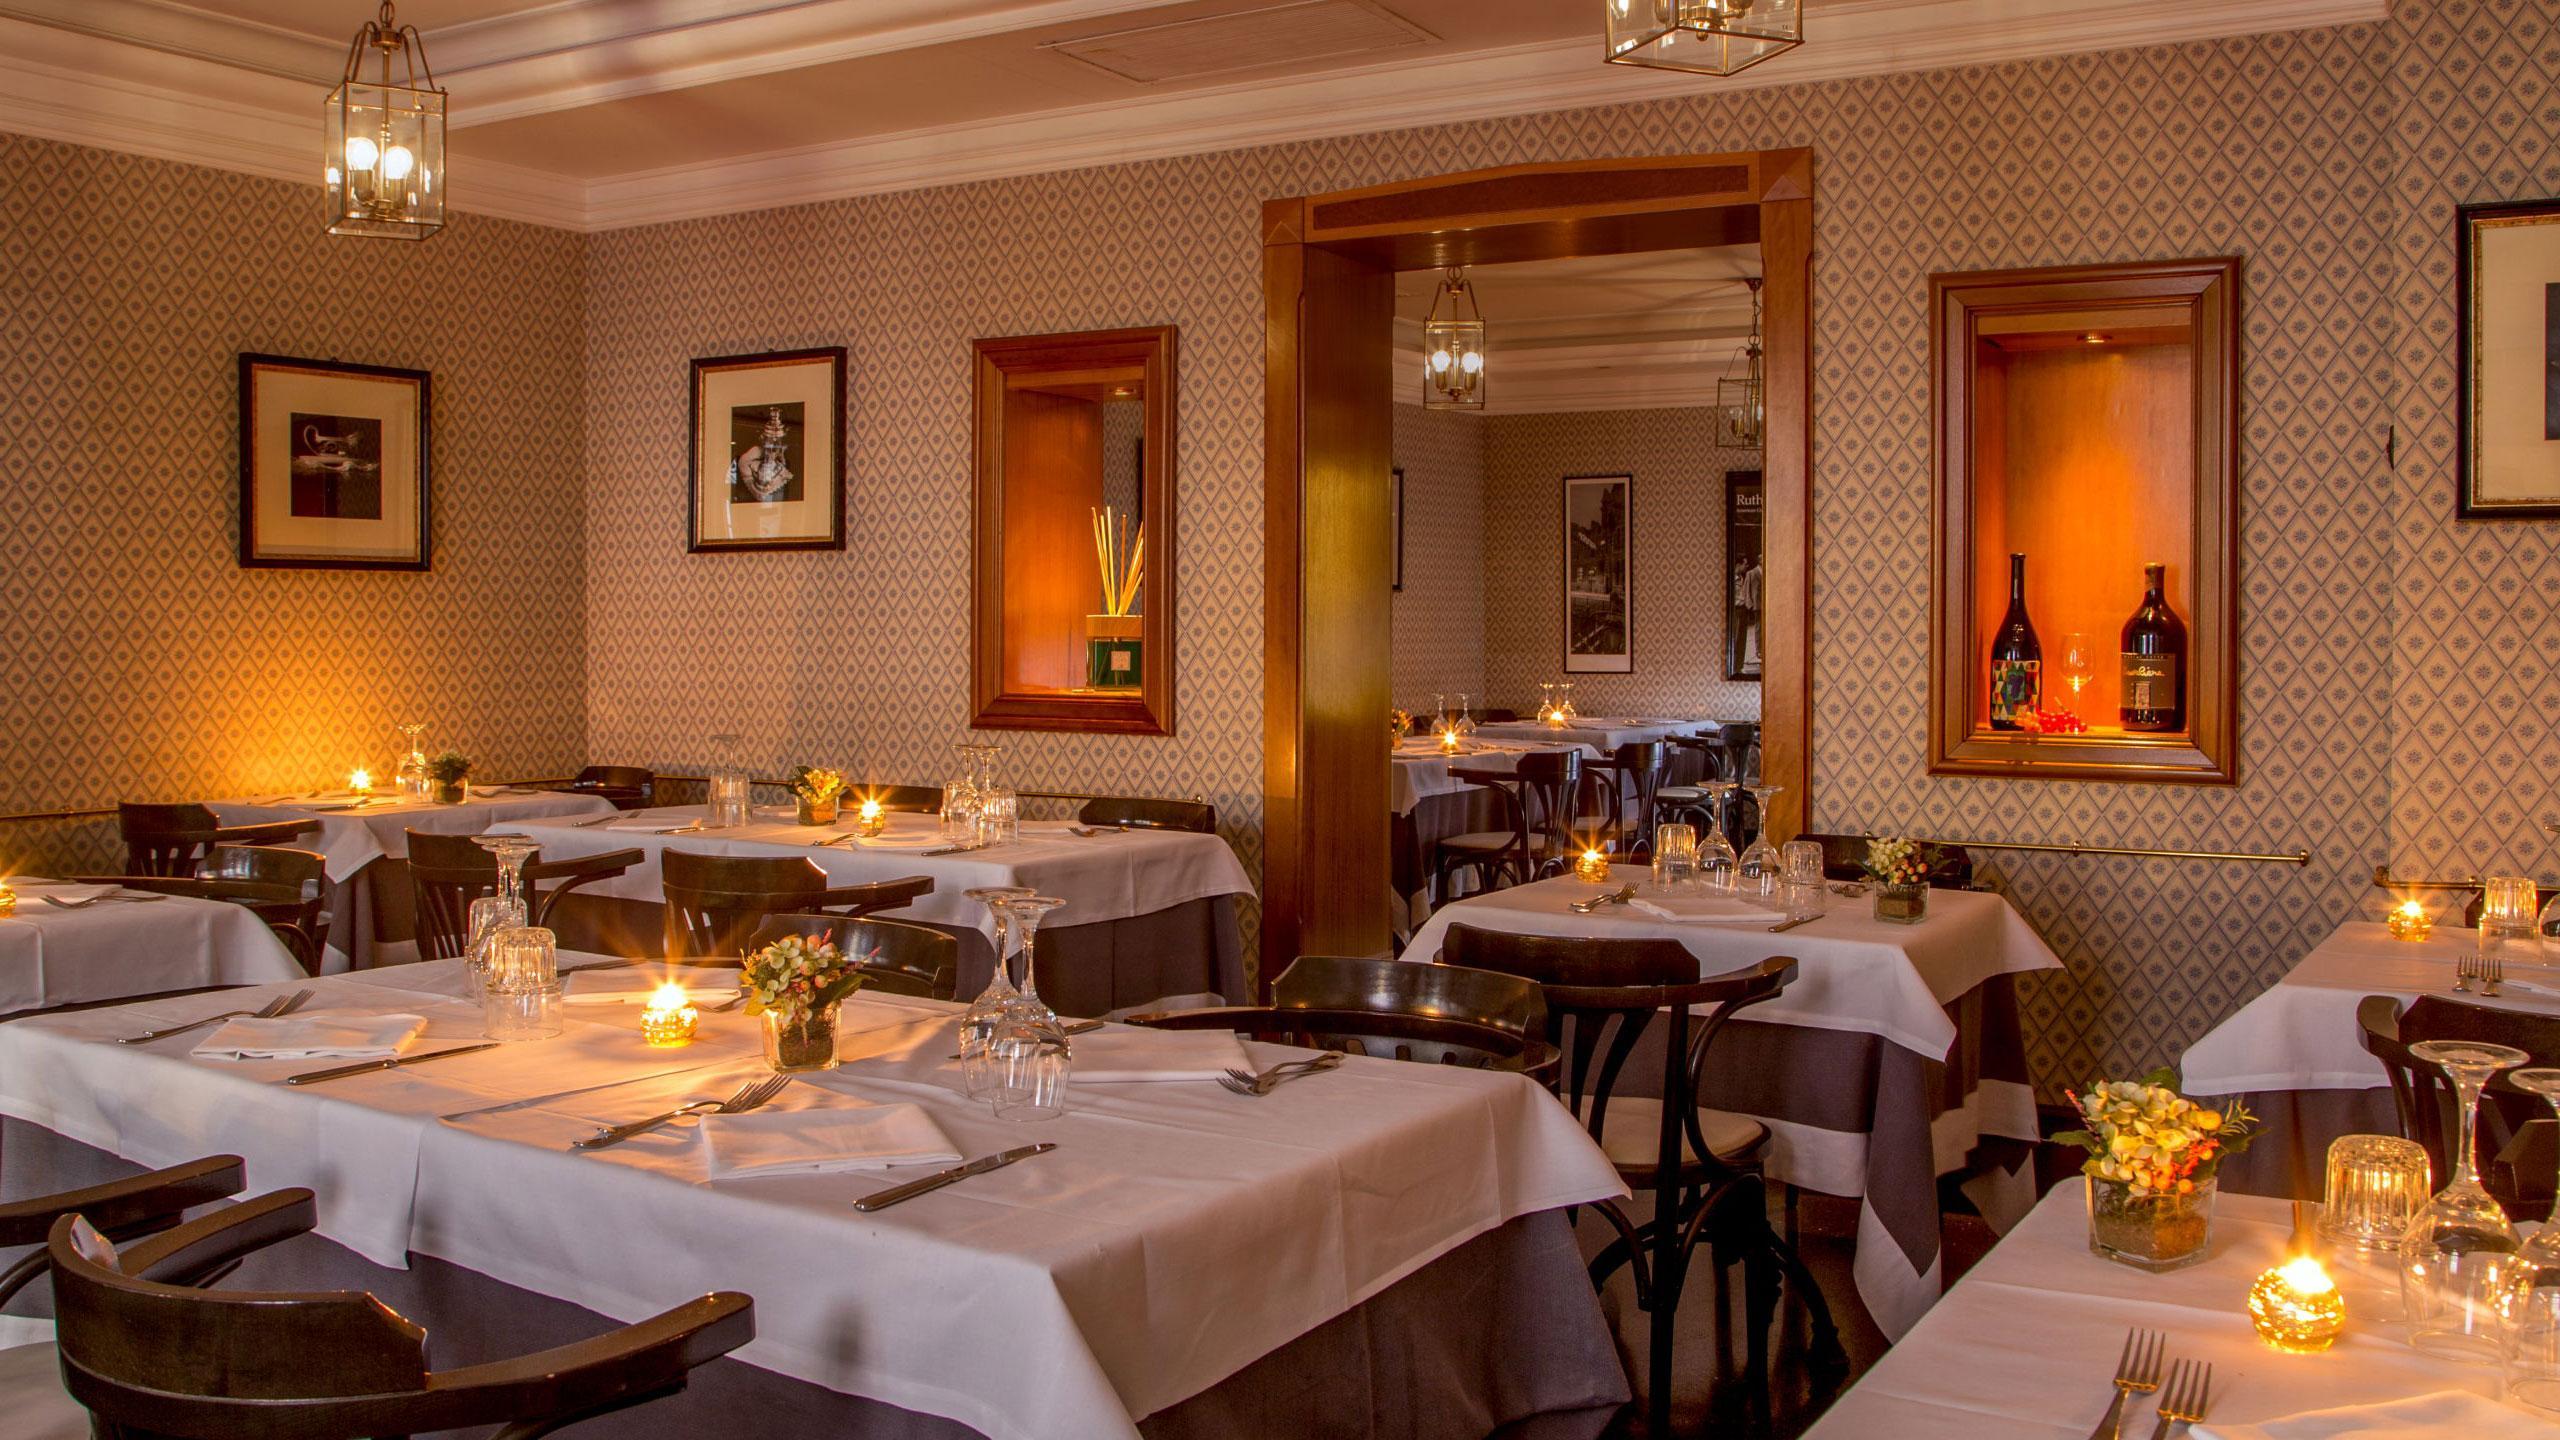 albergo-ottocento-rome-rossini-restaurant-02